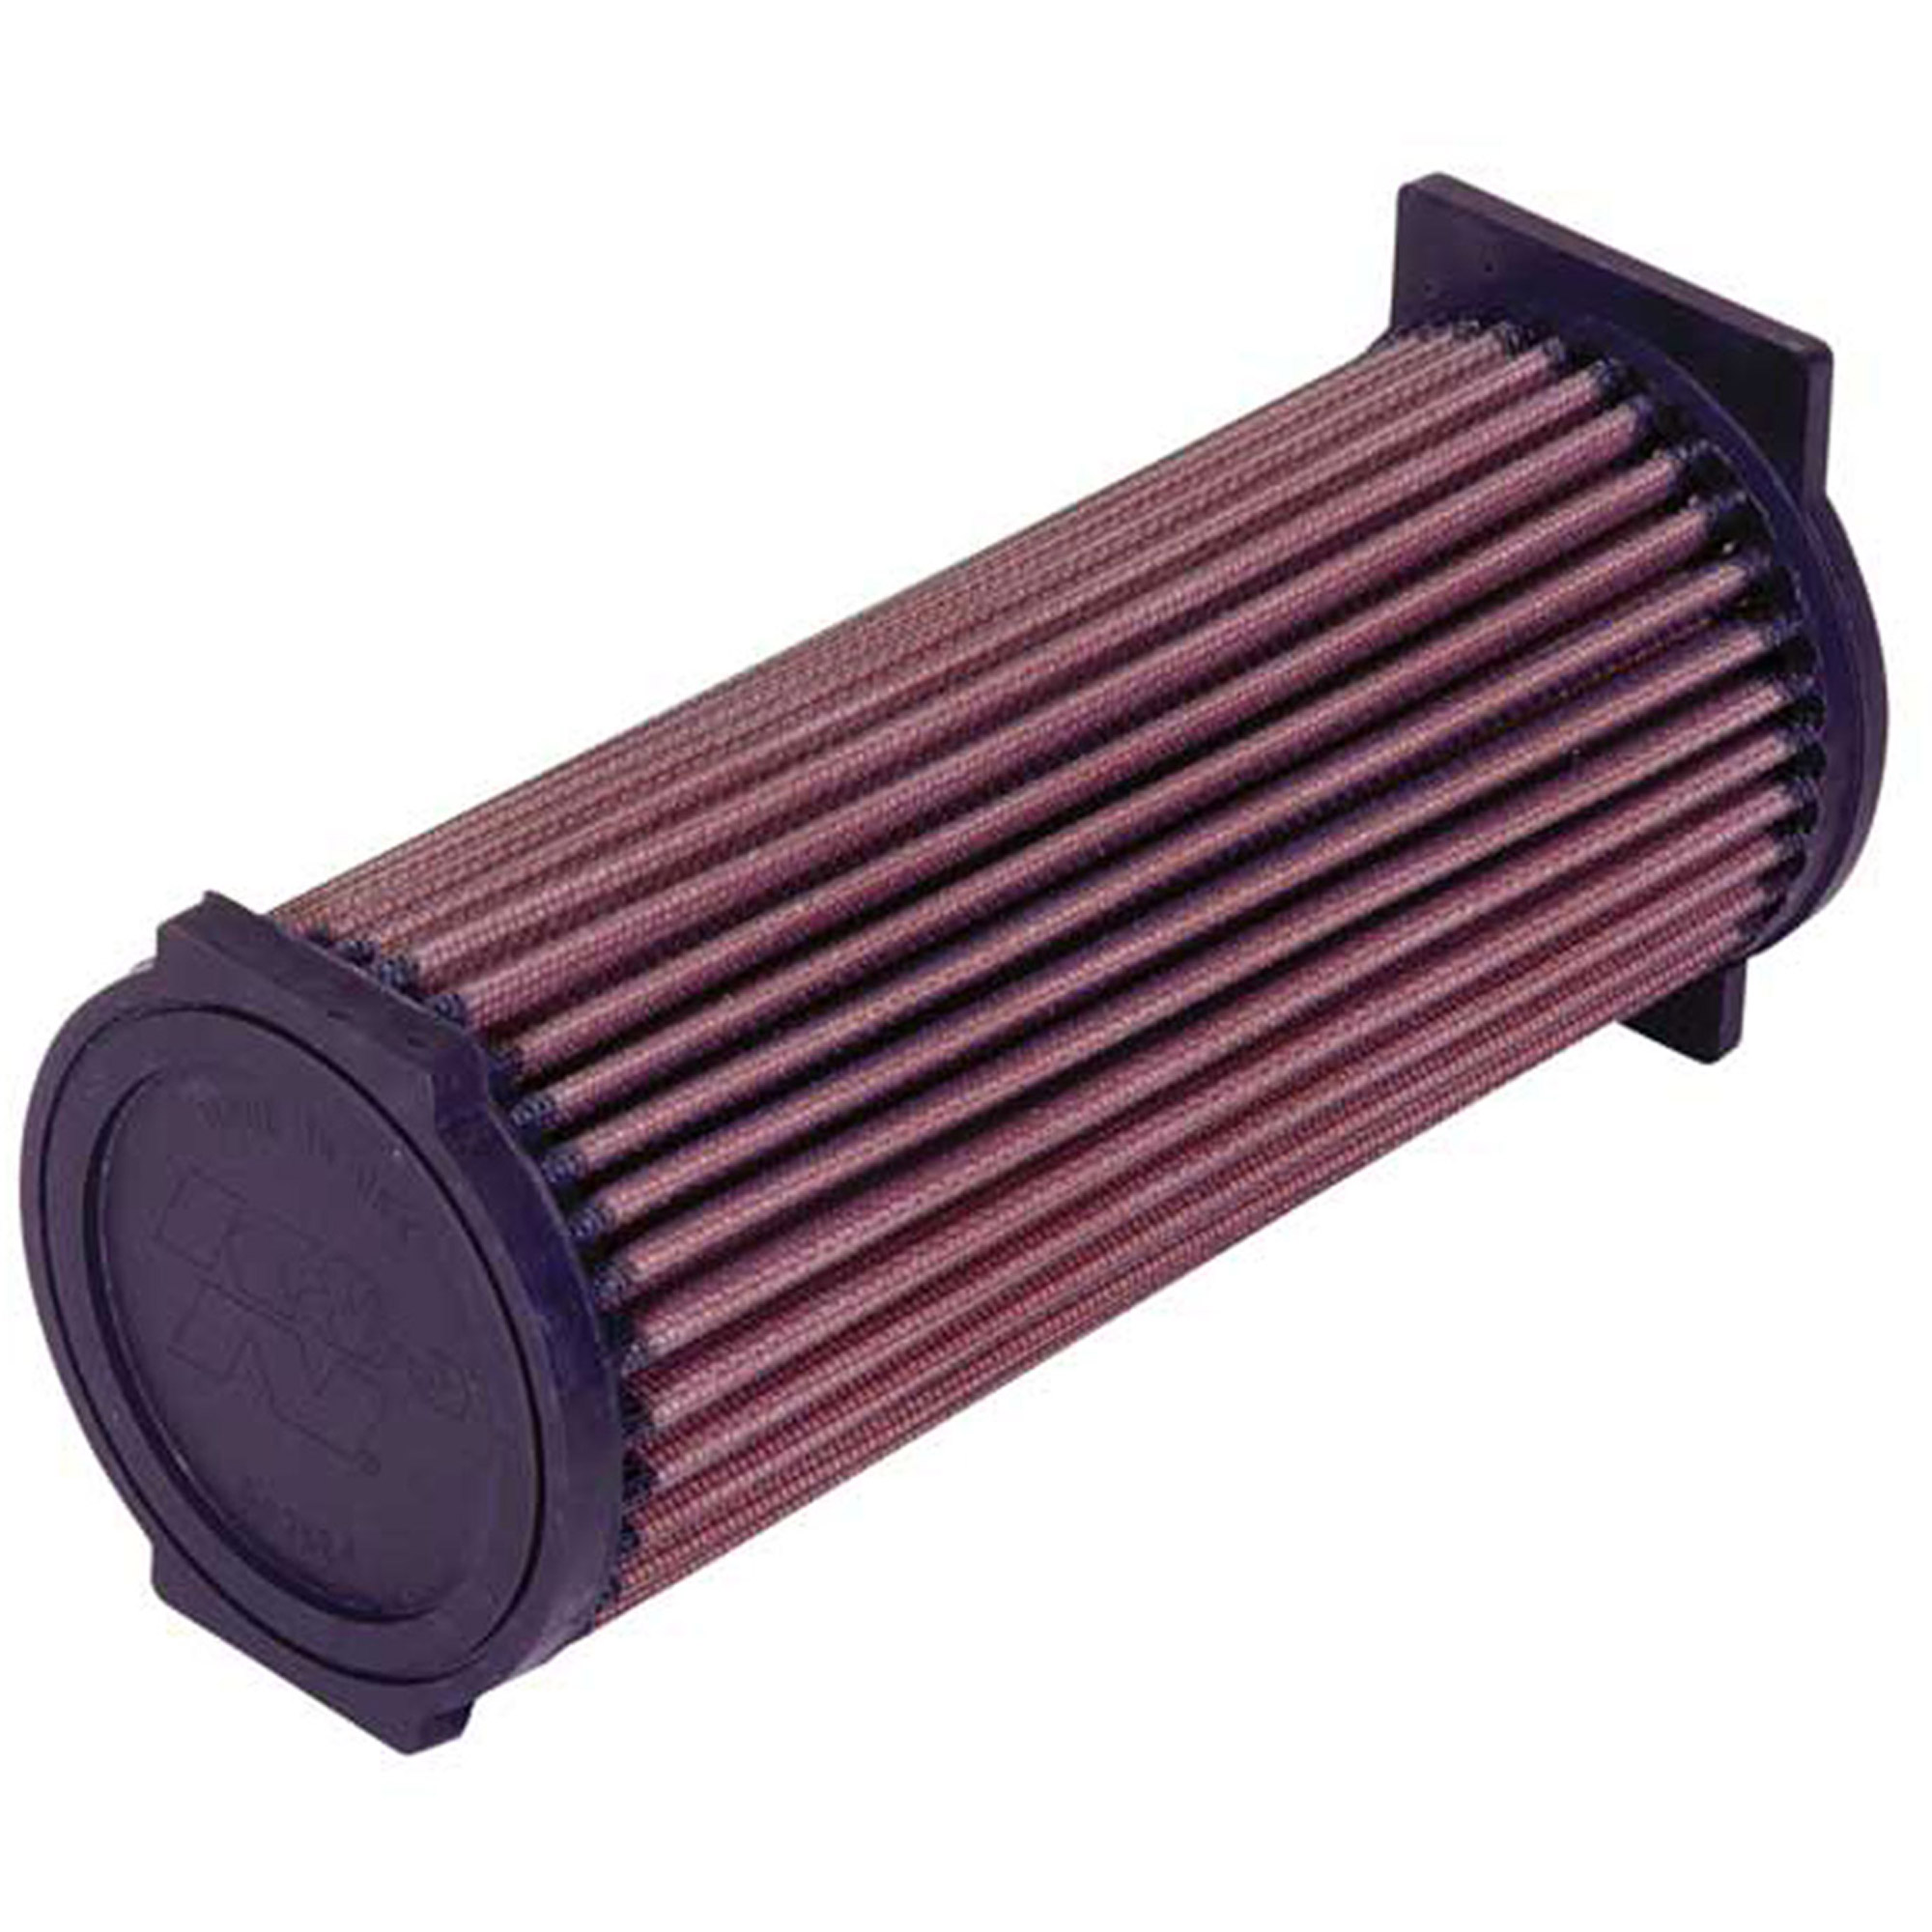 K&N YA-6602 Yamaha High Performance Replacement Air Filter